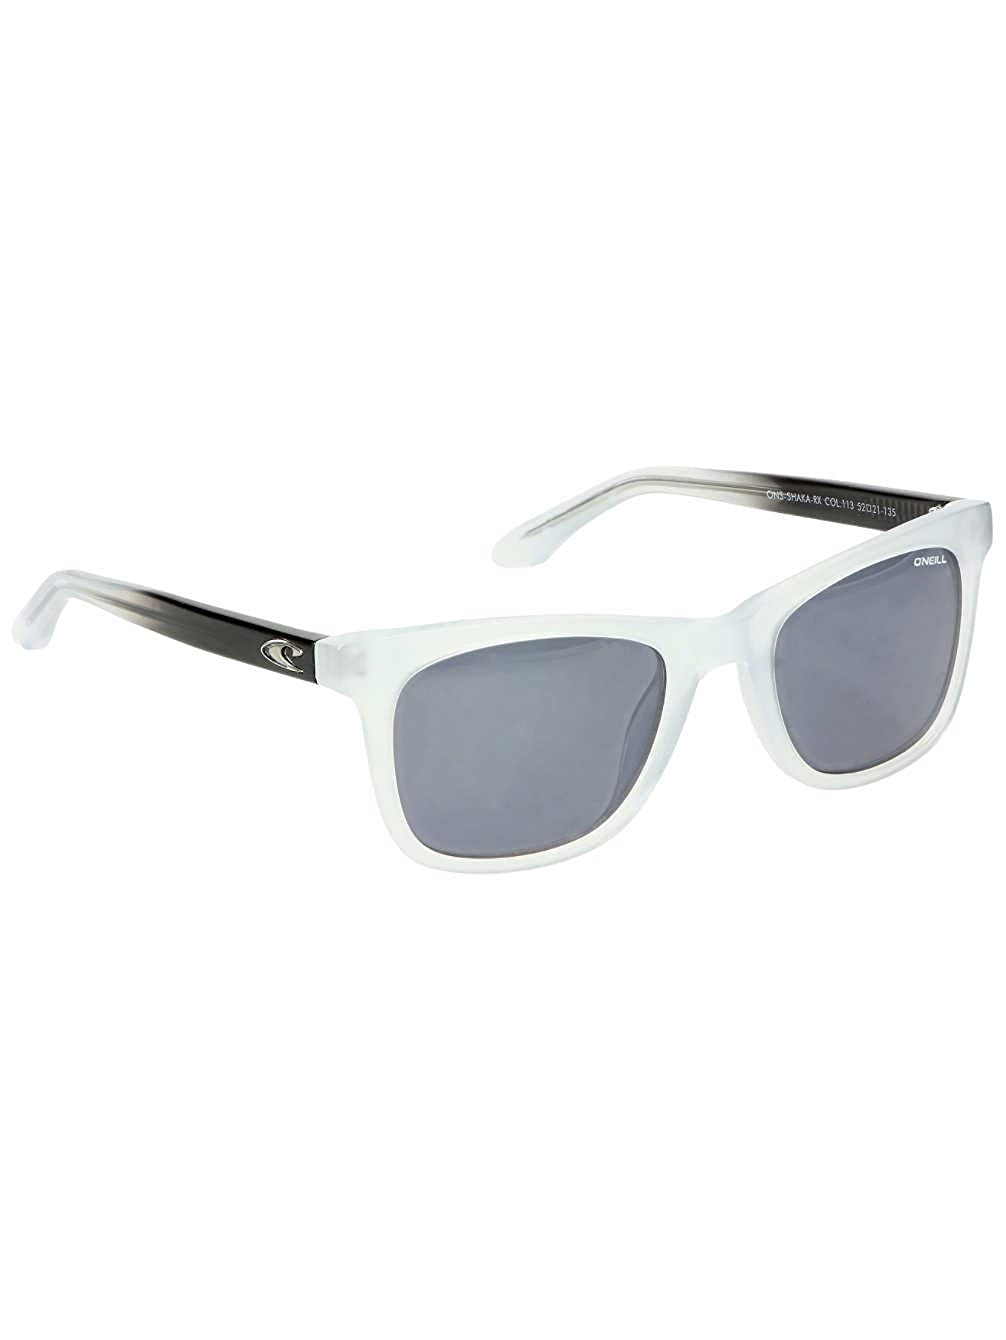 ONeill Eyewear - Gafas de sol - para hombre morado talla única ...